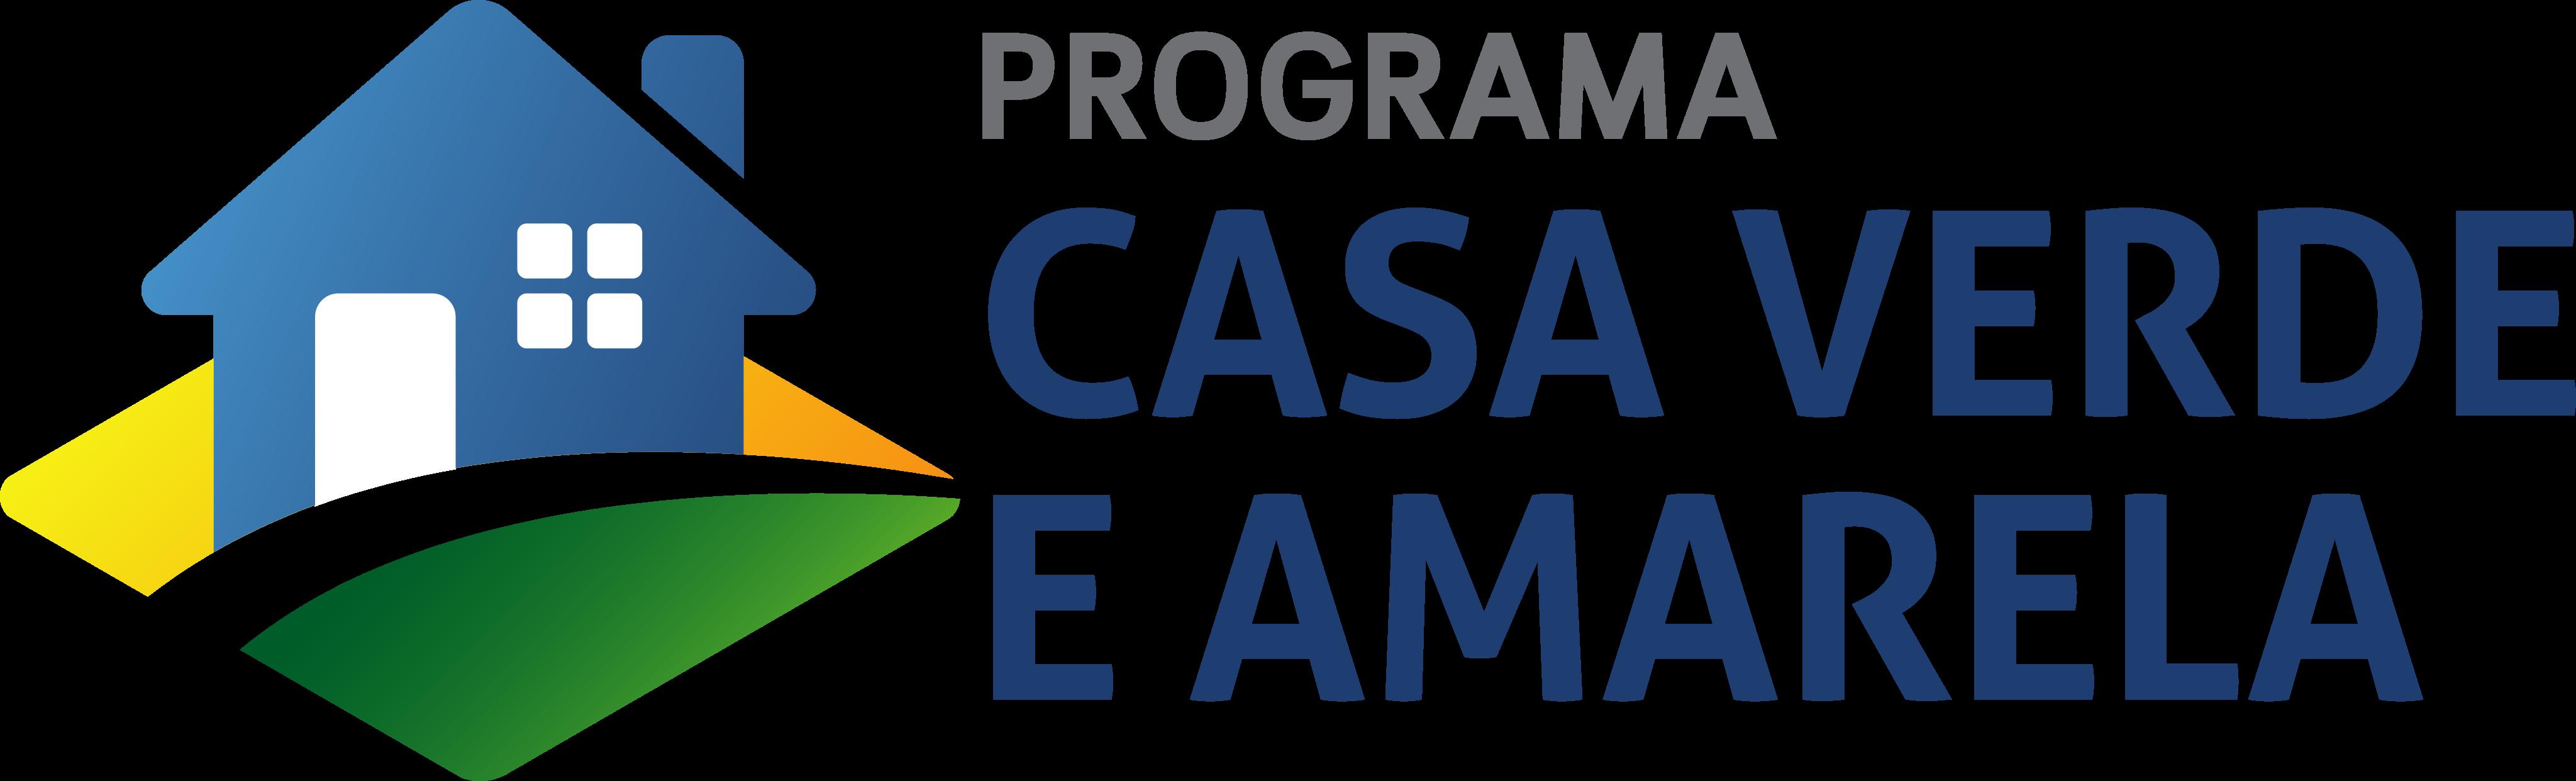 Programa Casa Verde e Amarela Logo.